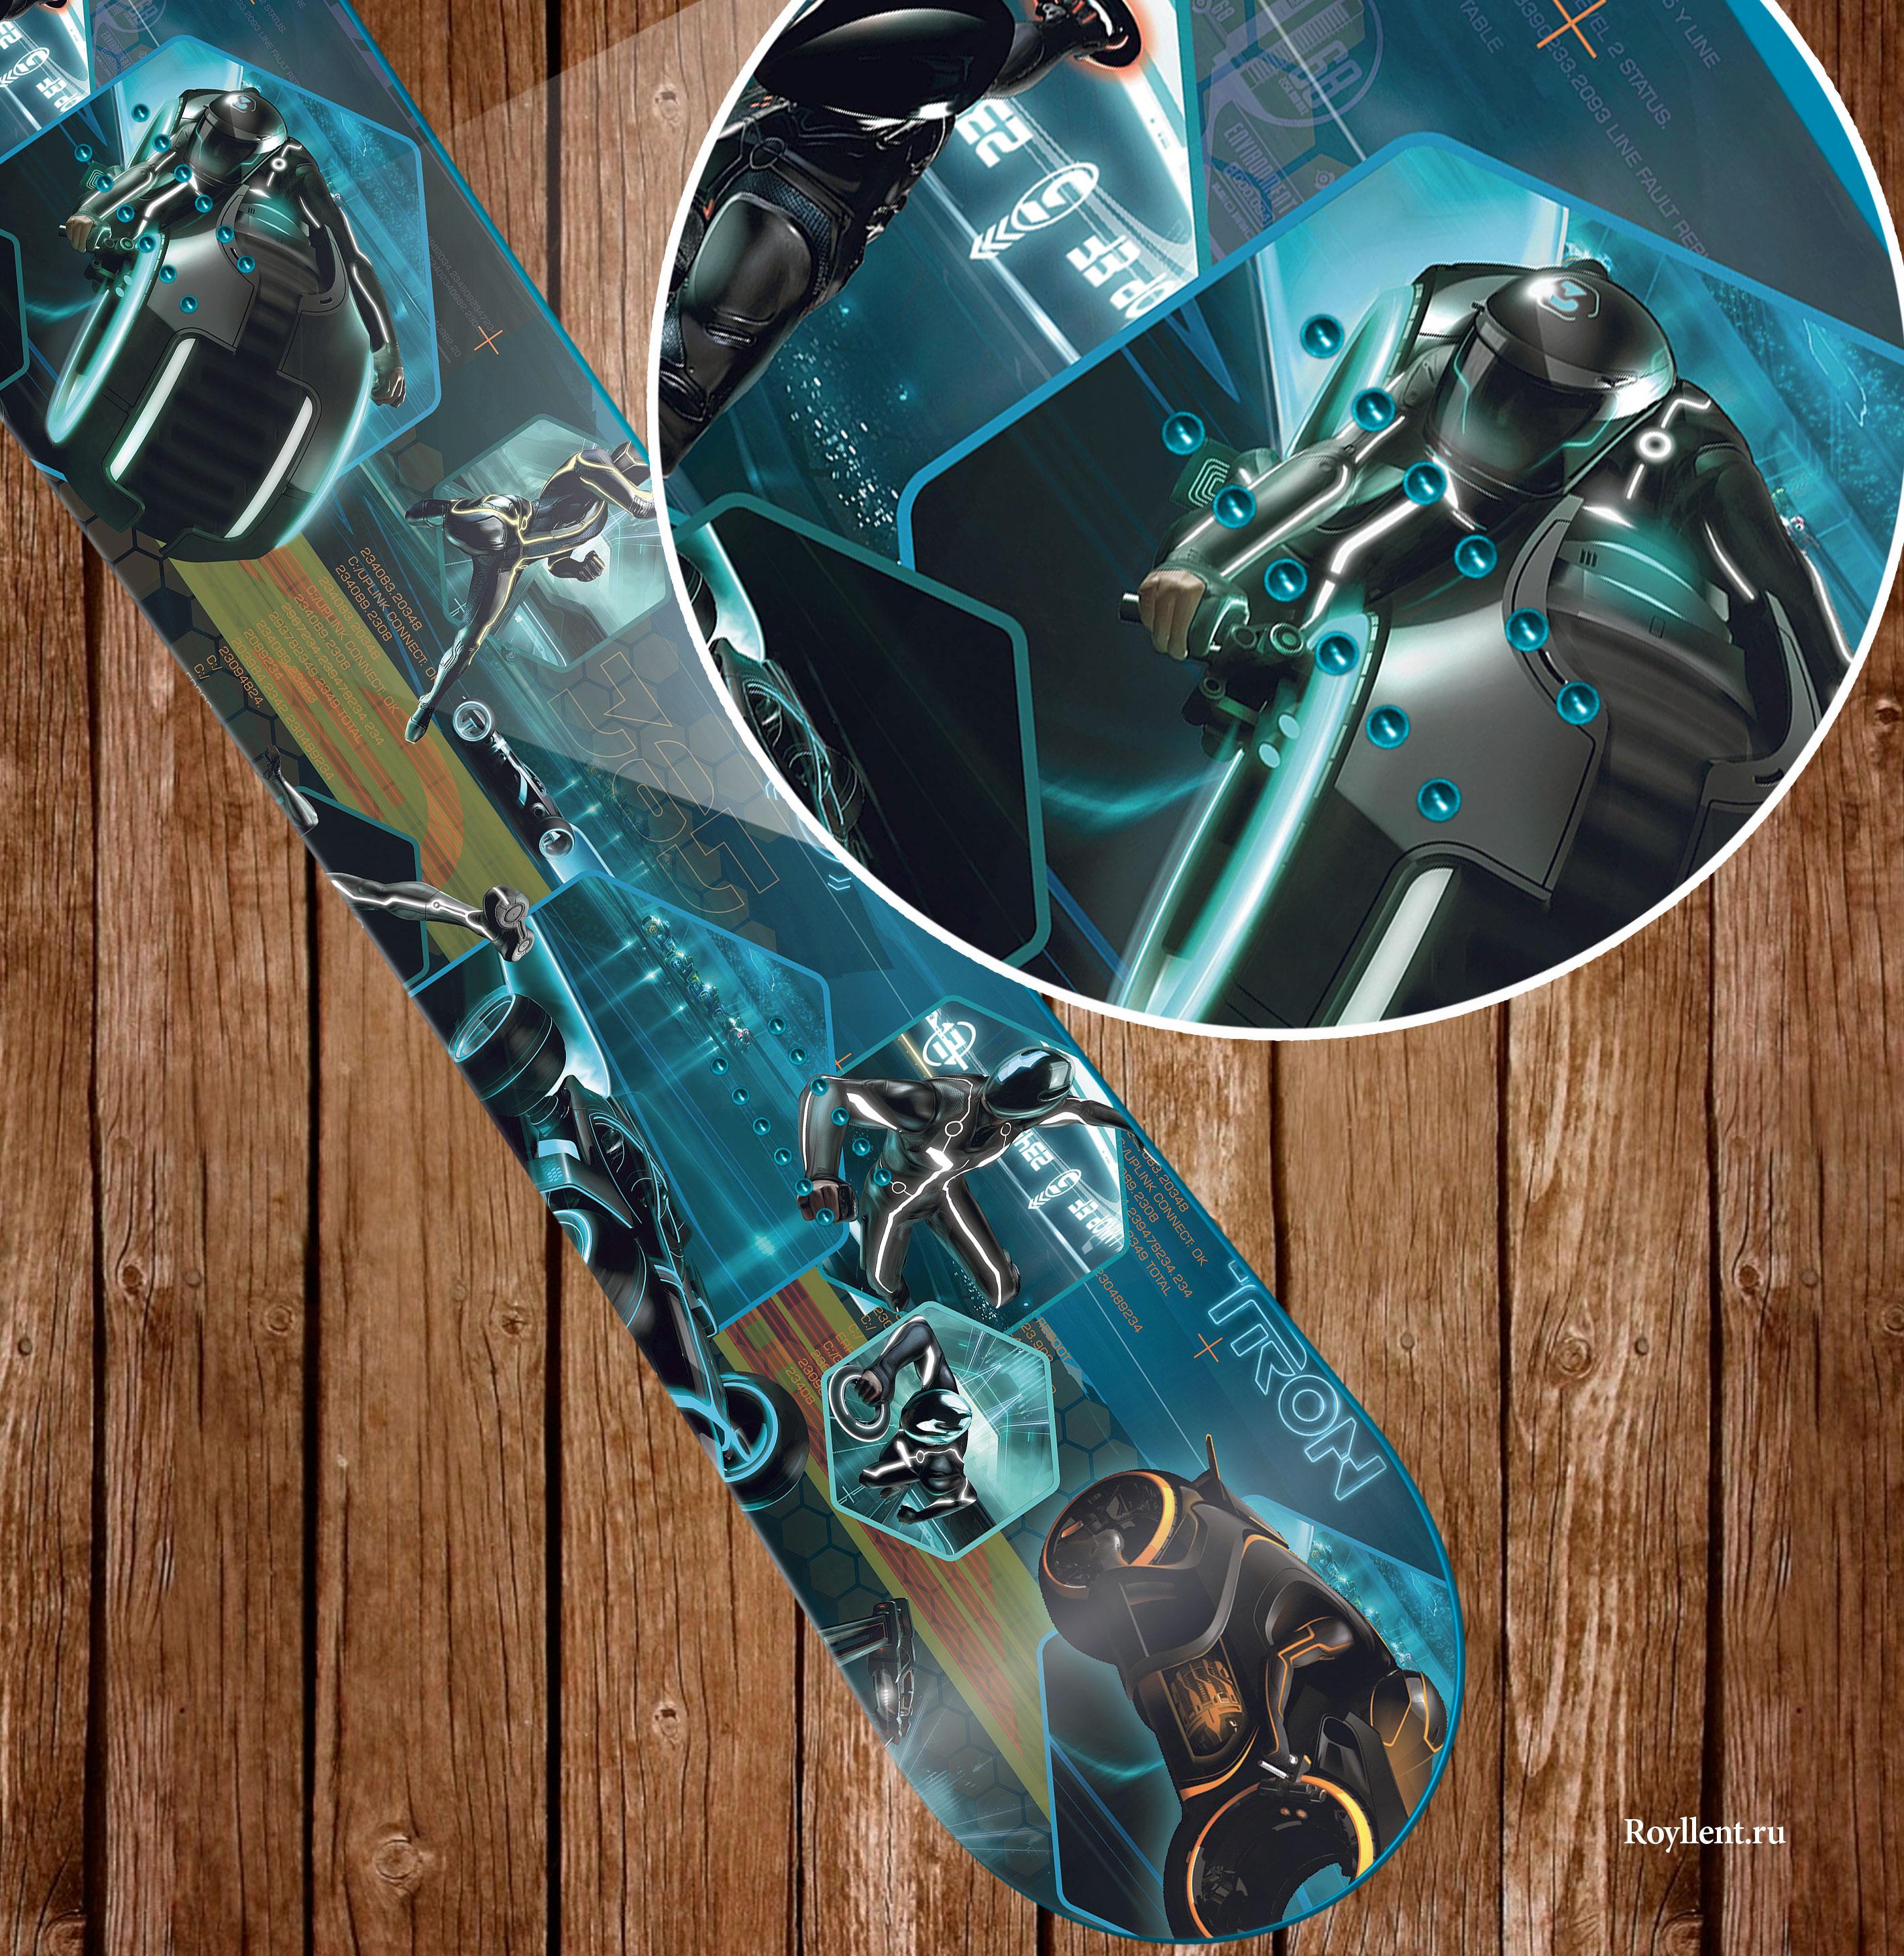 Виниловая наклейка на сноуборд Трон